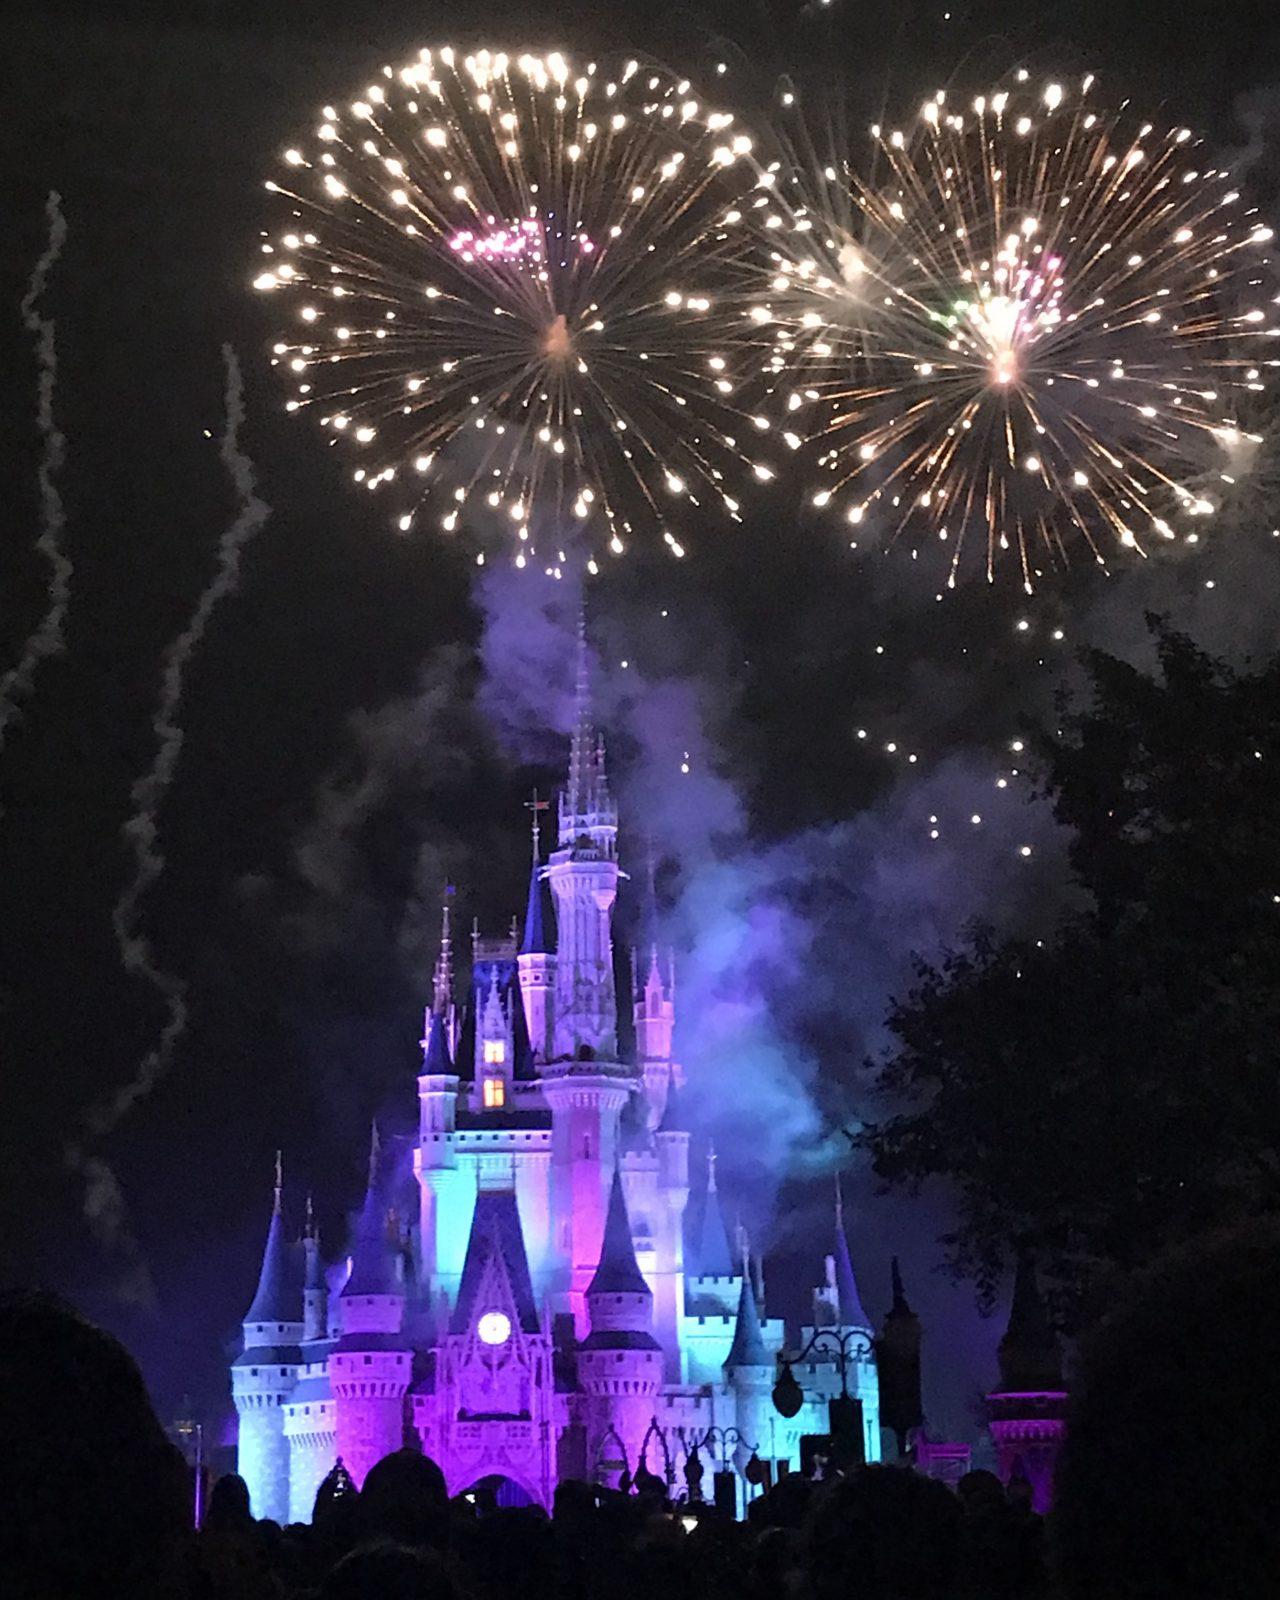 nighttime fireworks over Cinderella's castle